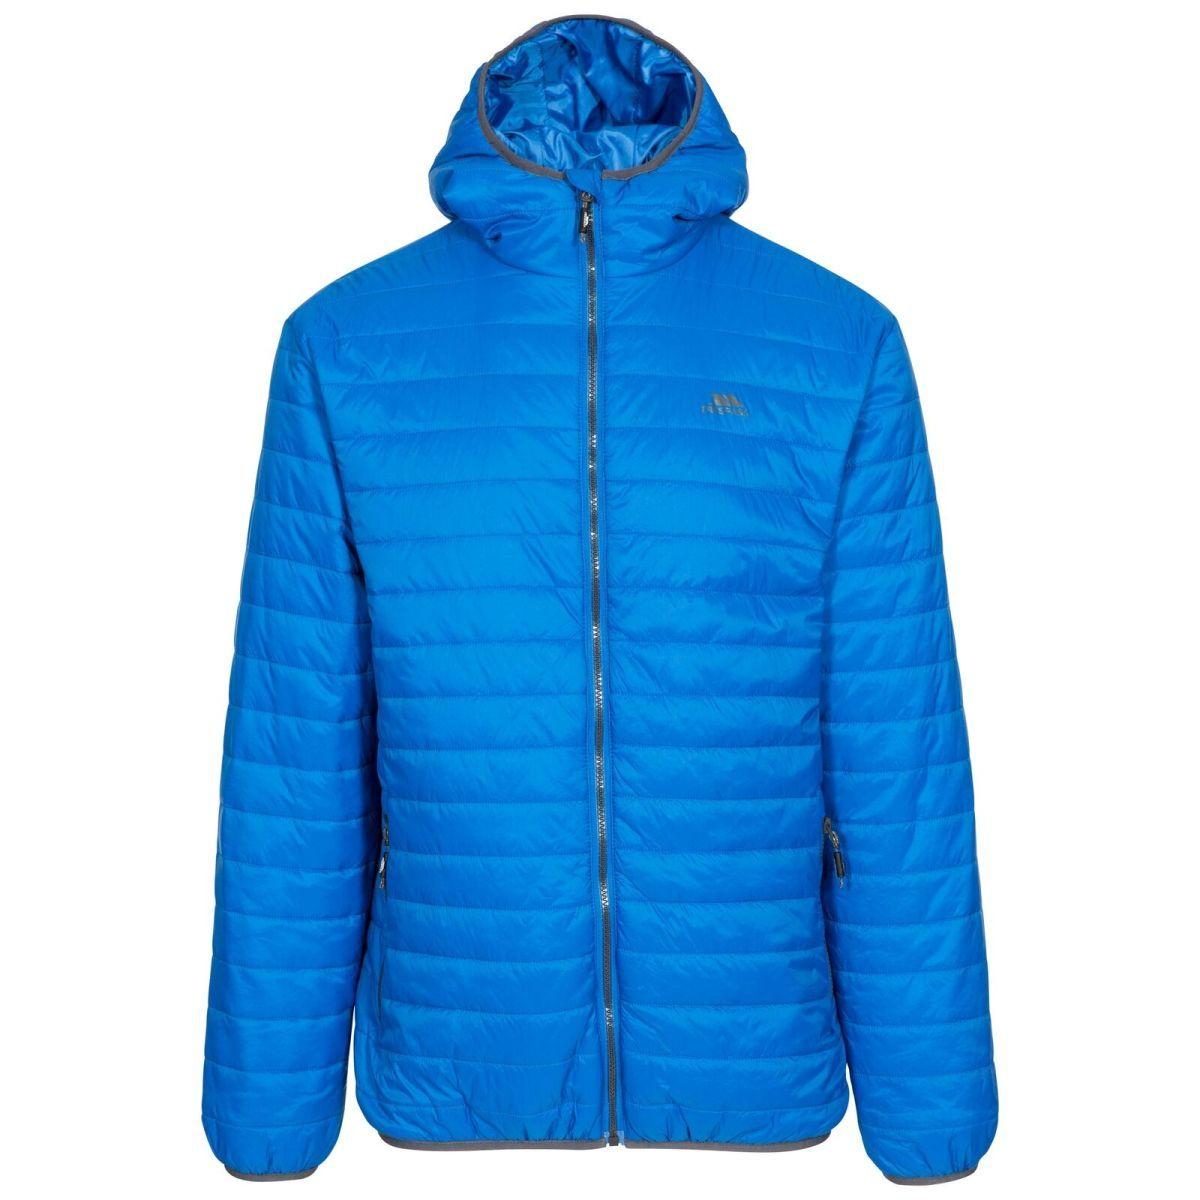 Trespass Men's Quilted Downtouch Jacket Blue Dunbar - Blue S